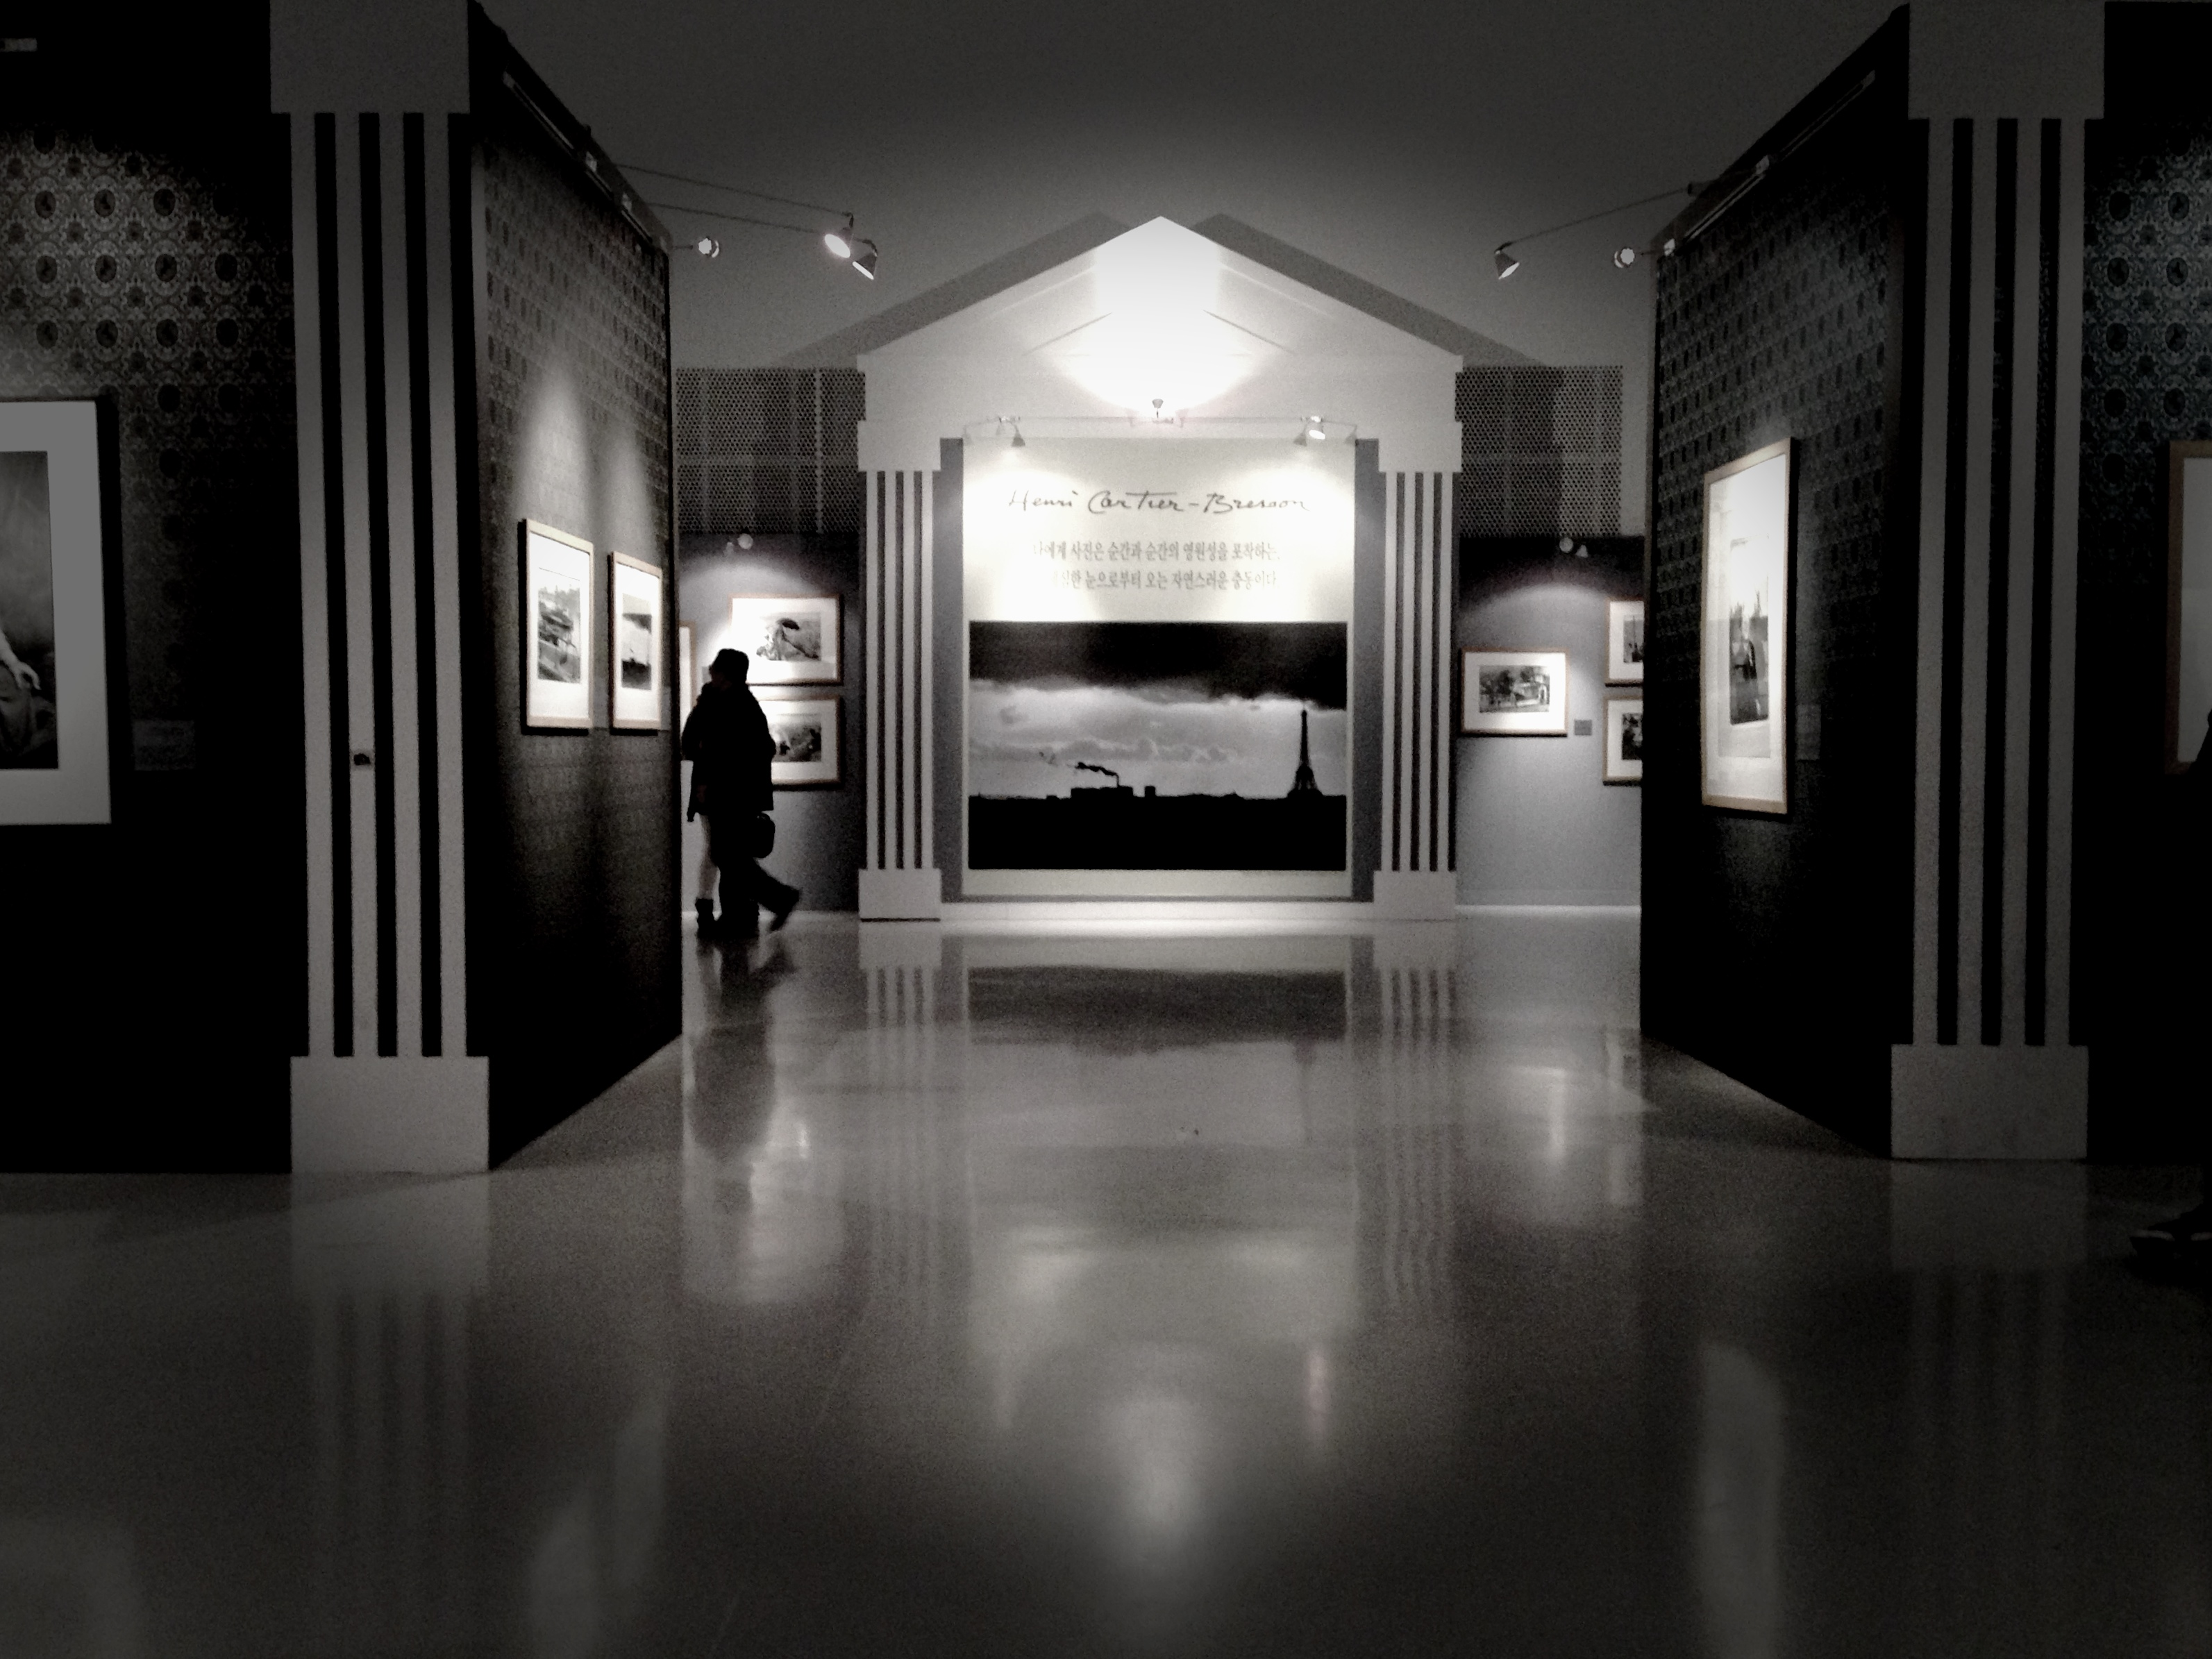 The Eternal Landscape: The 10th Anniversary Retrospective Exhibition of Henri Cartier-Bresson